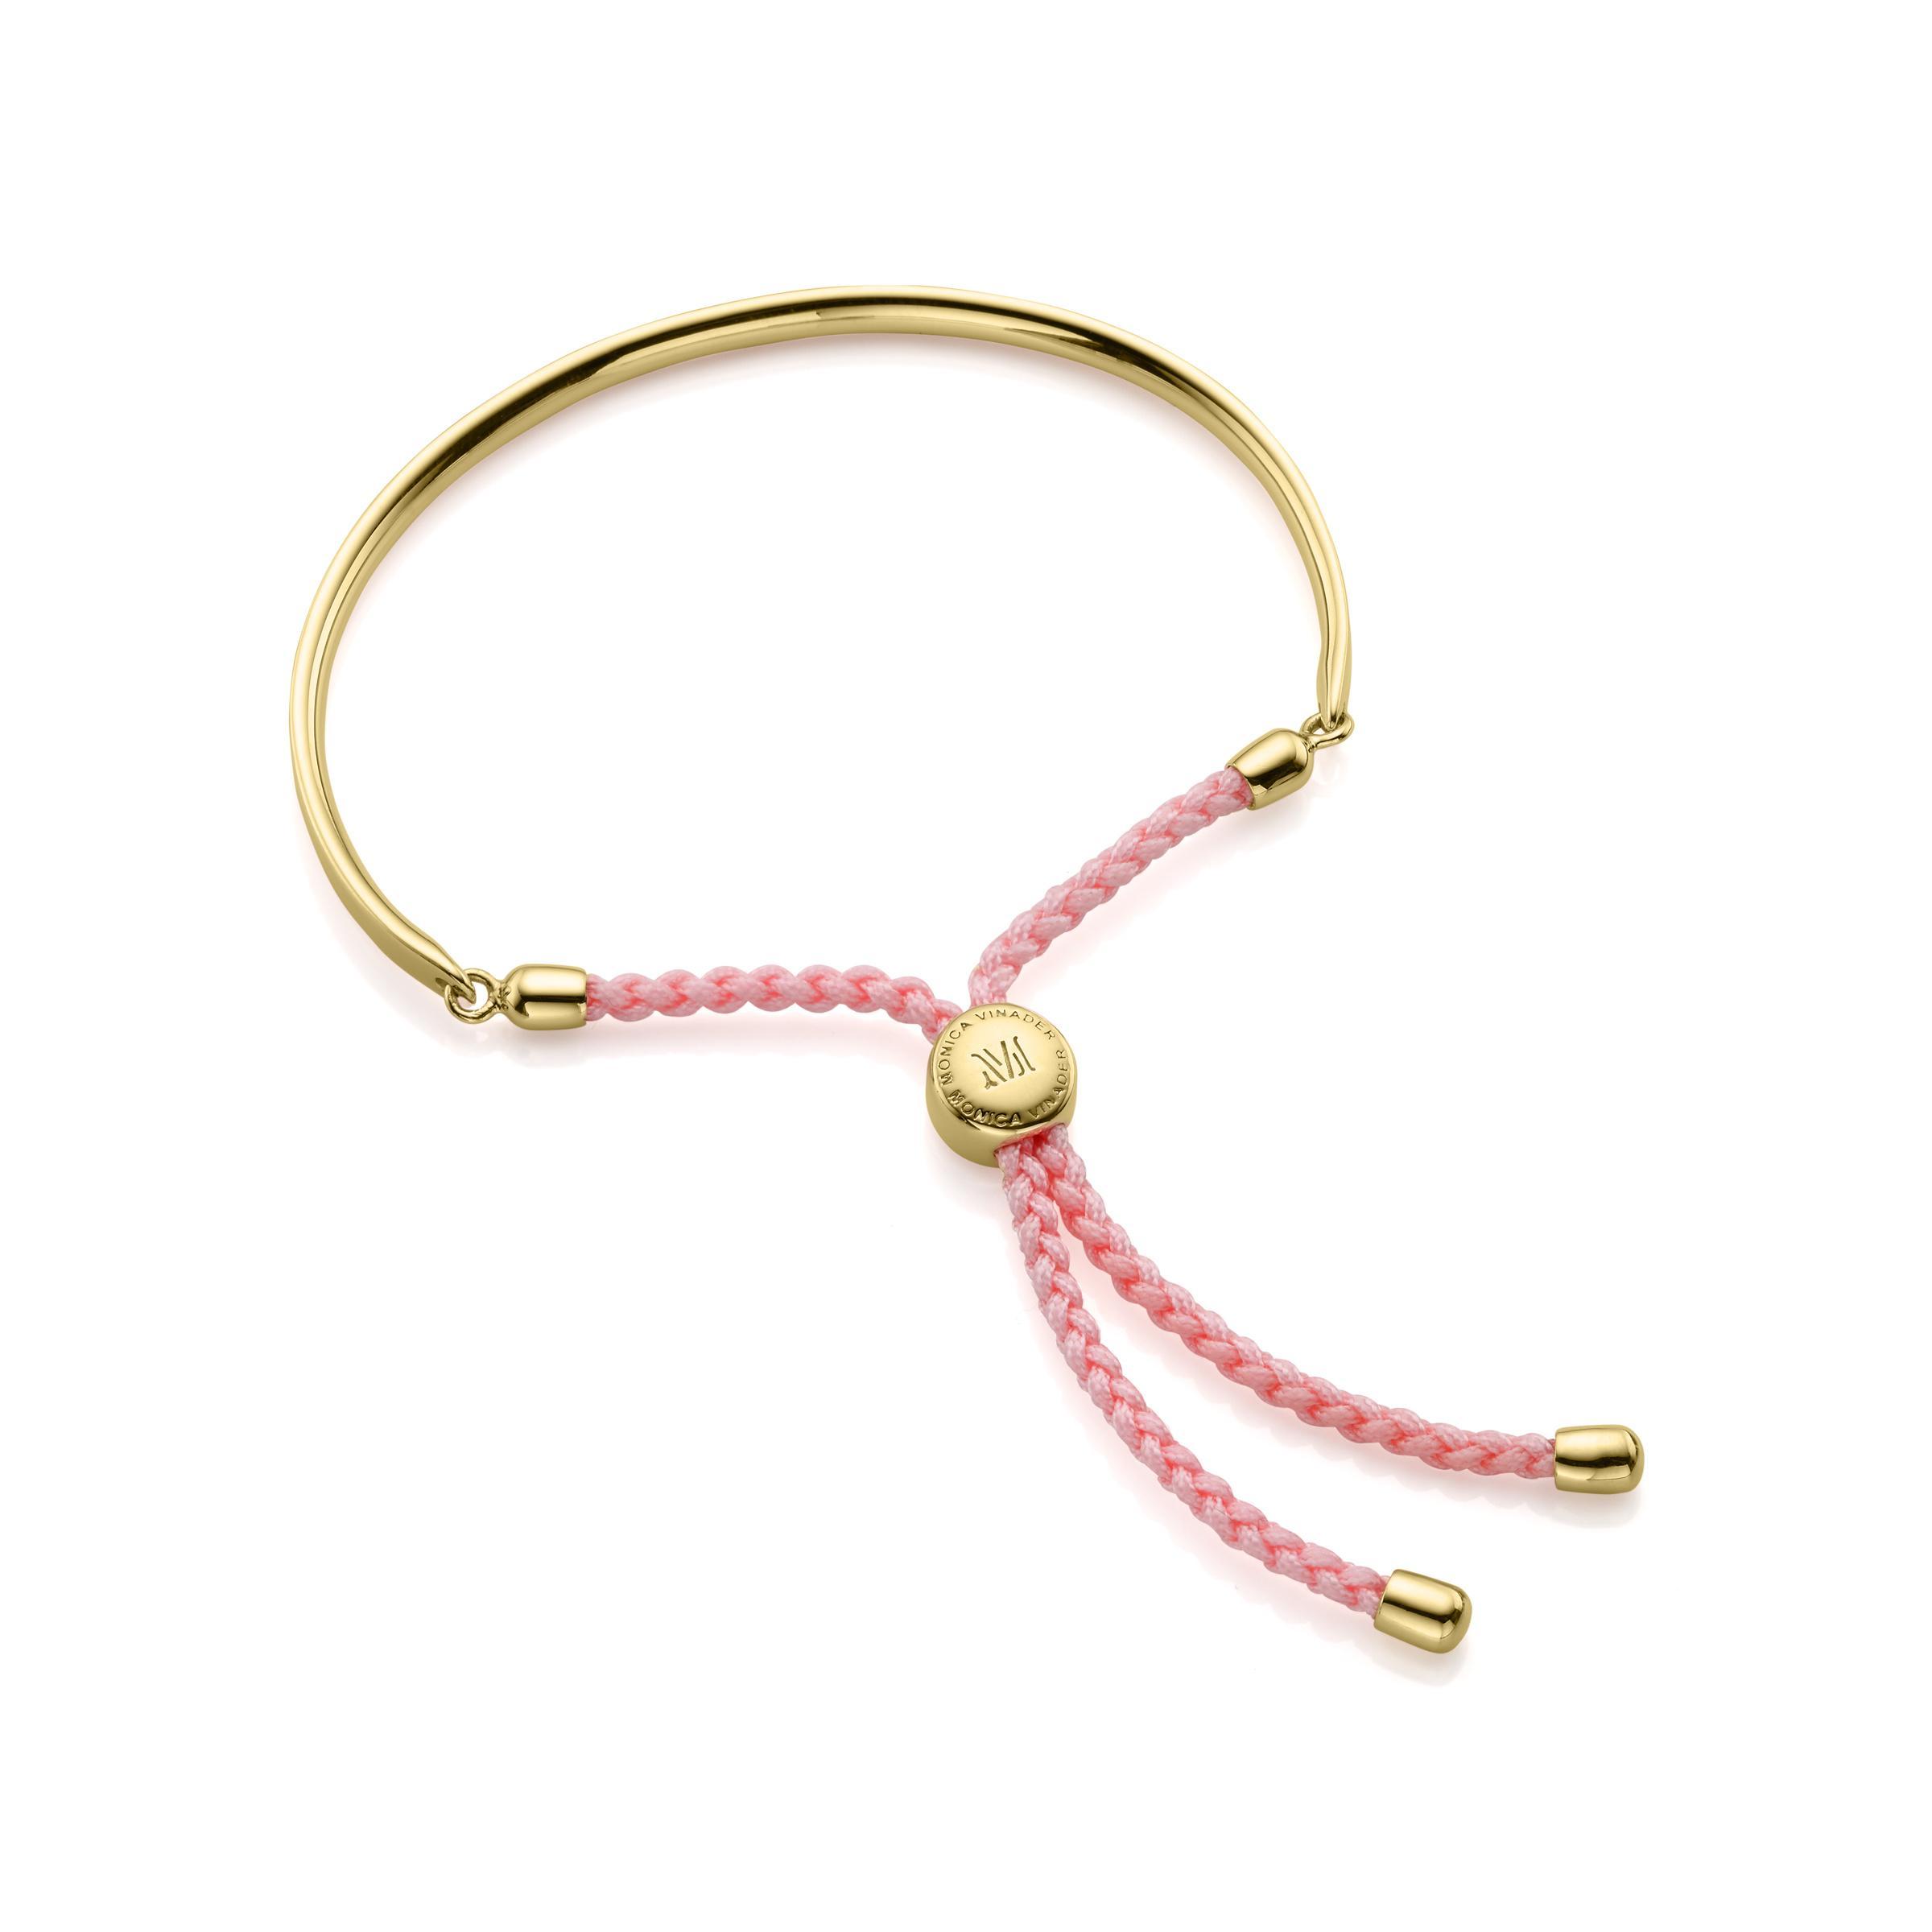 Fiji Friendship Petite Chain Bracelet, Sterling Silver Monica Vinader